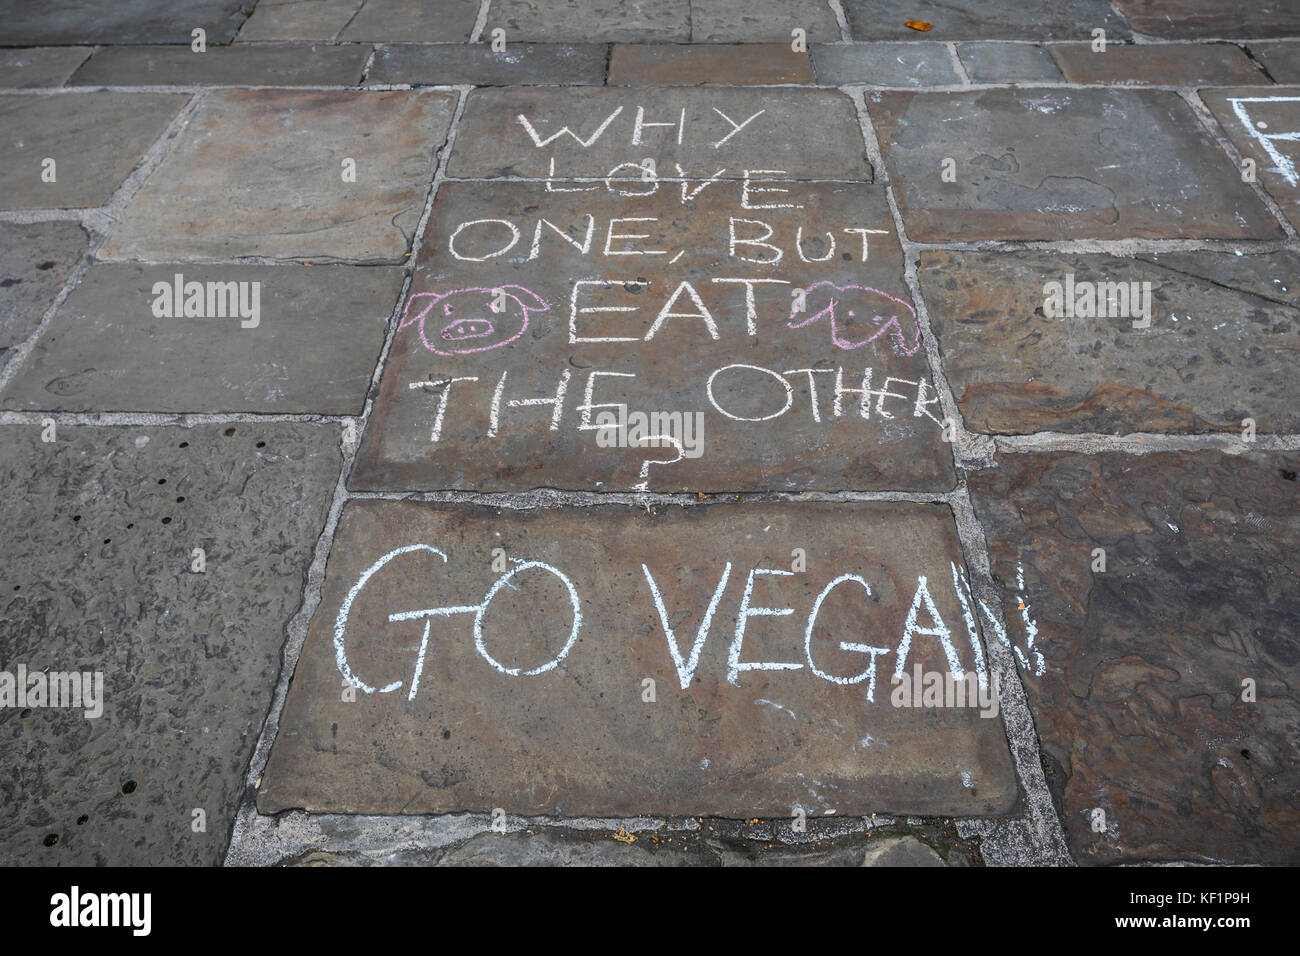 Go vegan graffiti - Stock Image